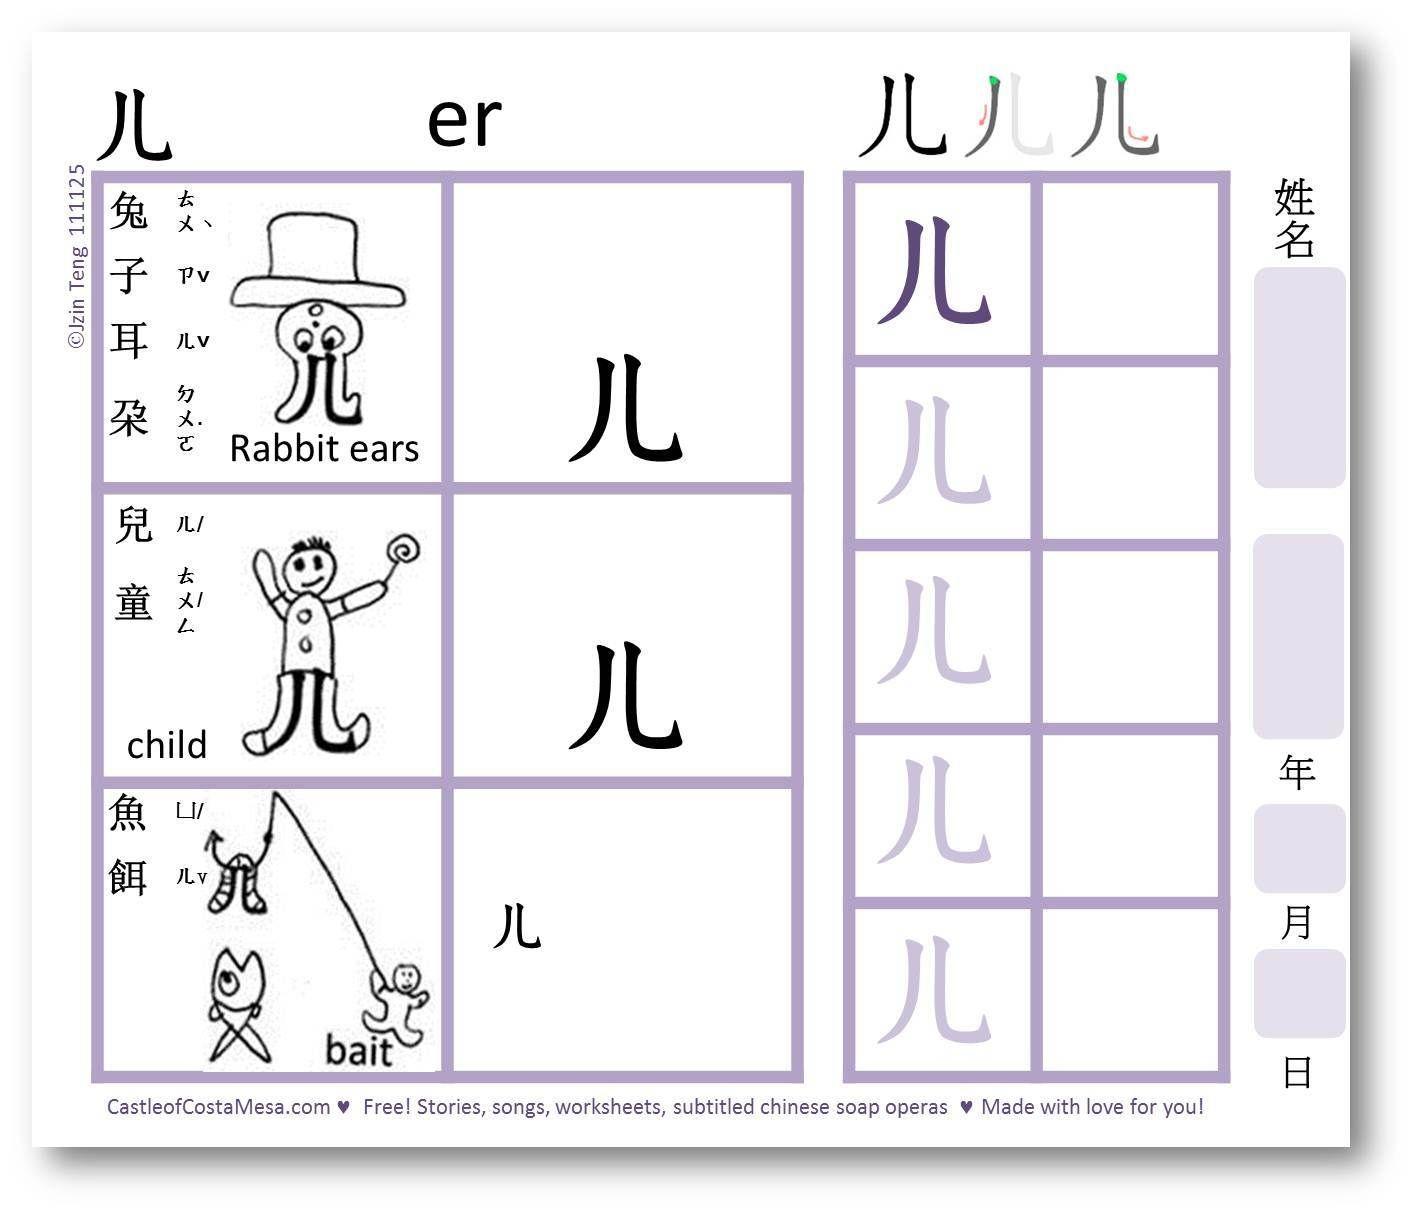 Er Shadow Bopomofo Zhuyin Fuhaoㄦer Free Download Pdf Printable Mandarin Chinese Children Mnemo Chinese Language Learning How To Memorize Things Learn Mandarin [ 1212 x 1415 Pixel ]